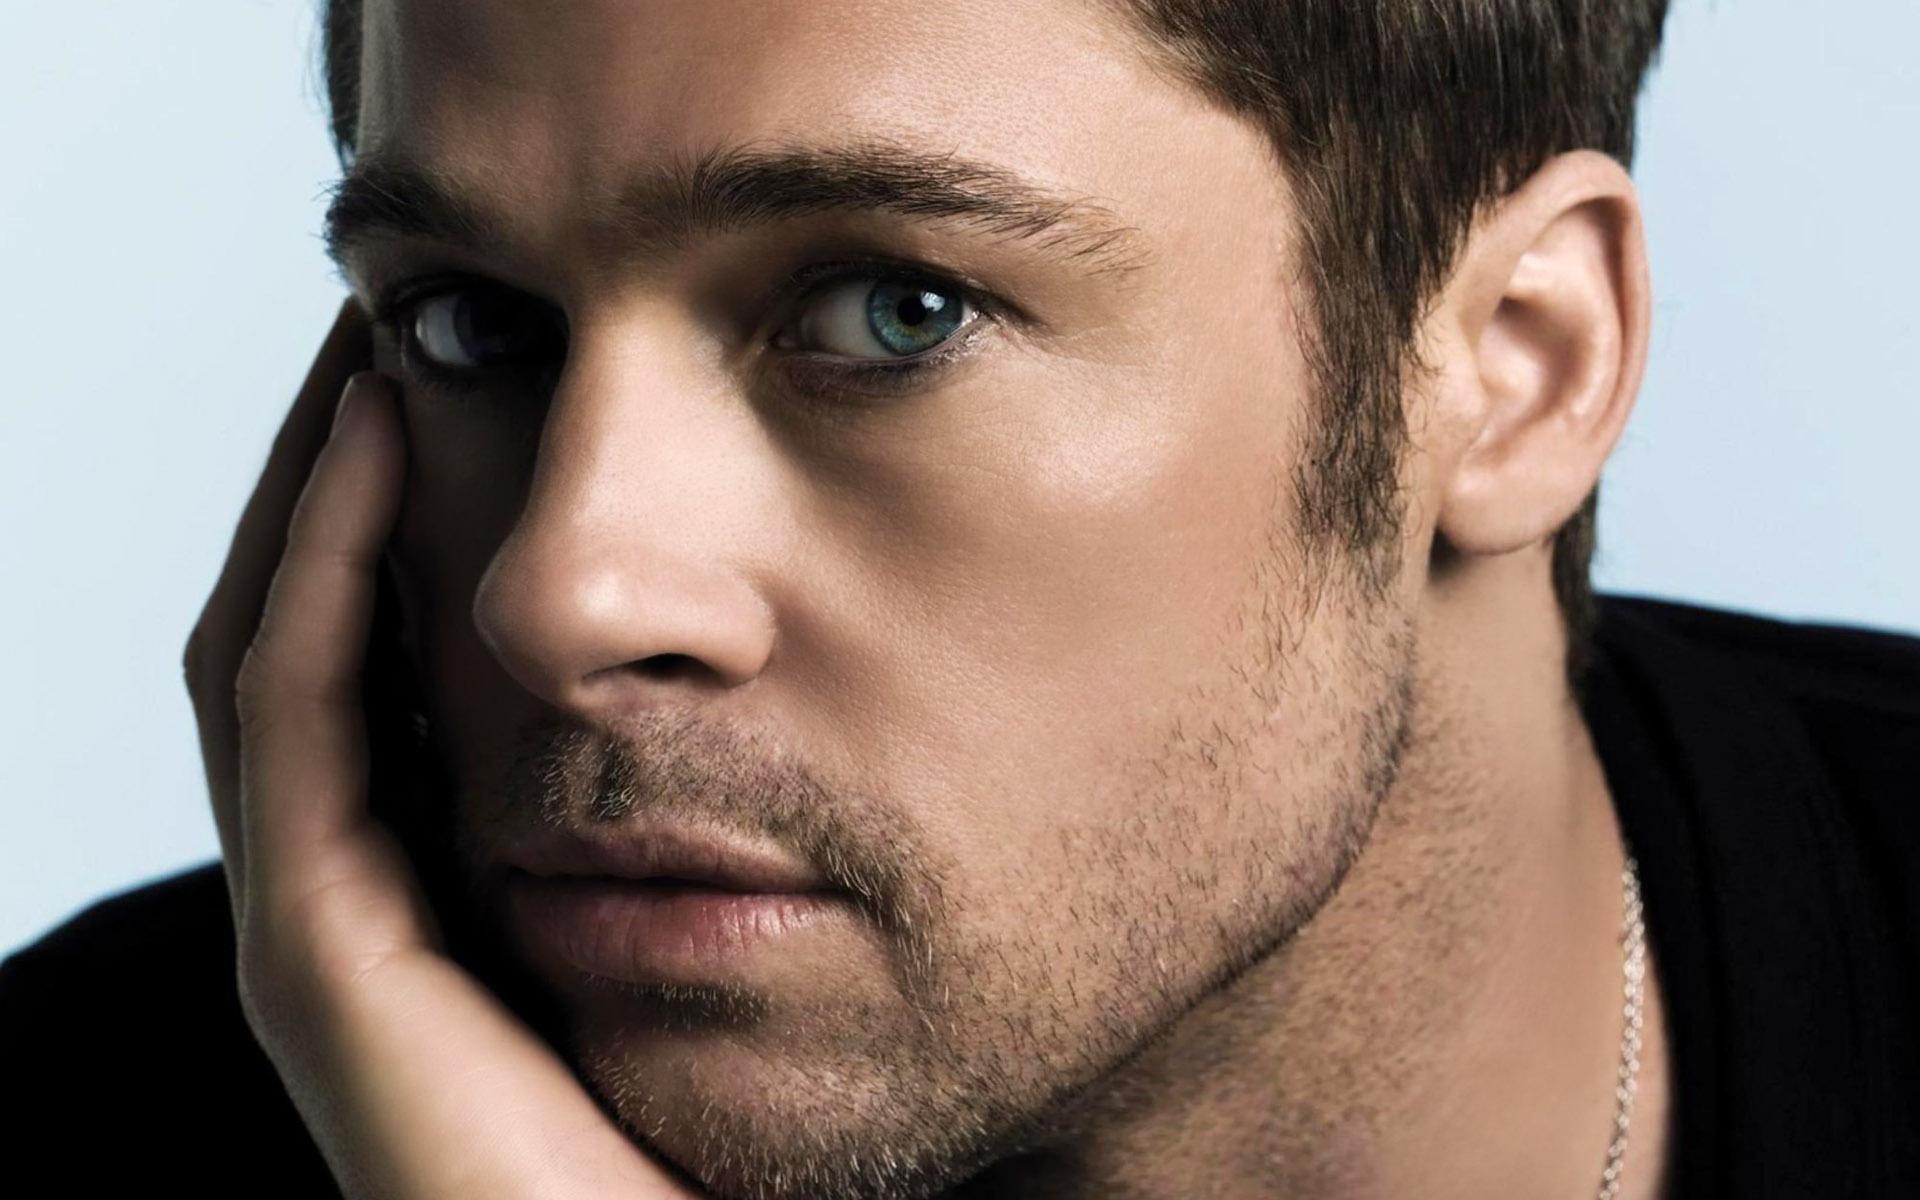 Tyler Durden Iphone Wallpaper Brad Pitt Full Hd Wallpaper And Background Image